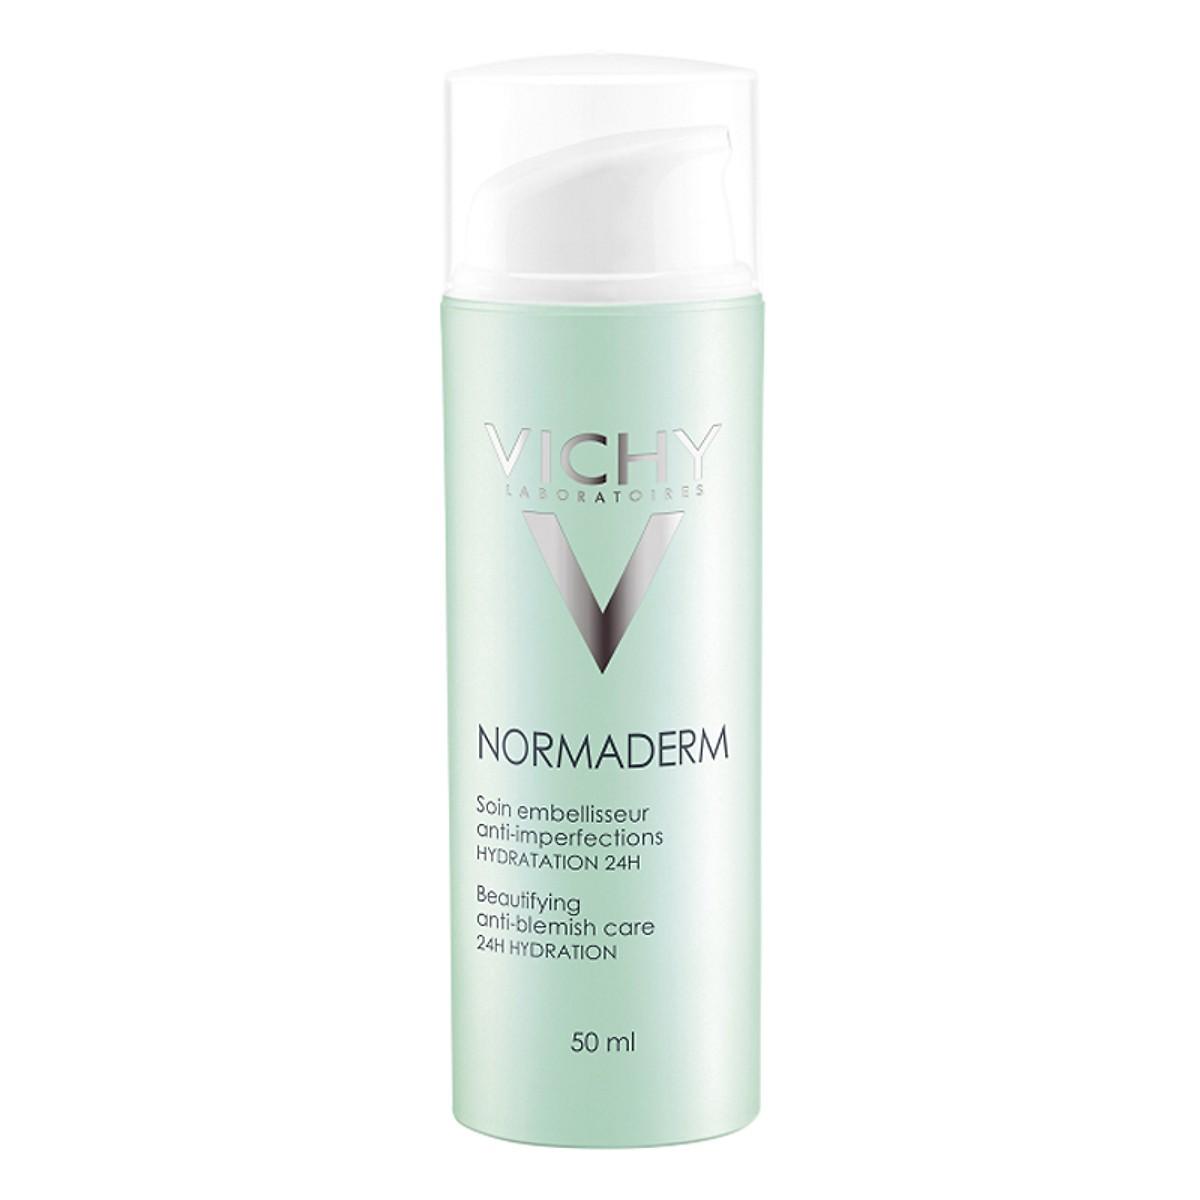 Kem dưỡng ẩm cho da dầu Normaderm TRI-ACTIV Vichy 50ml